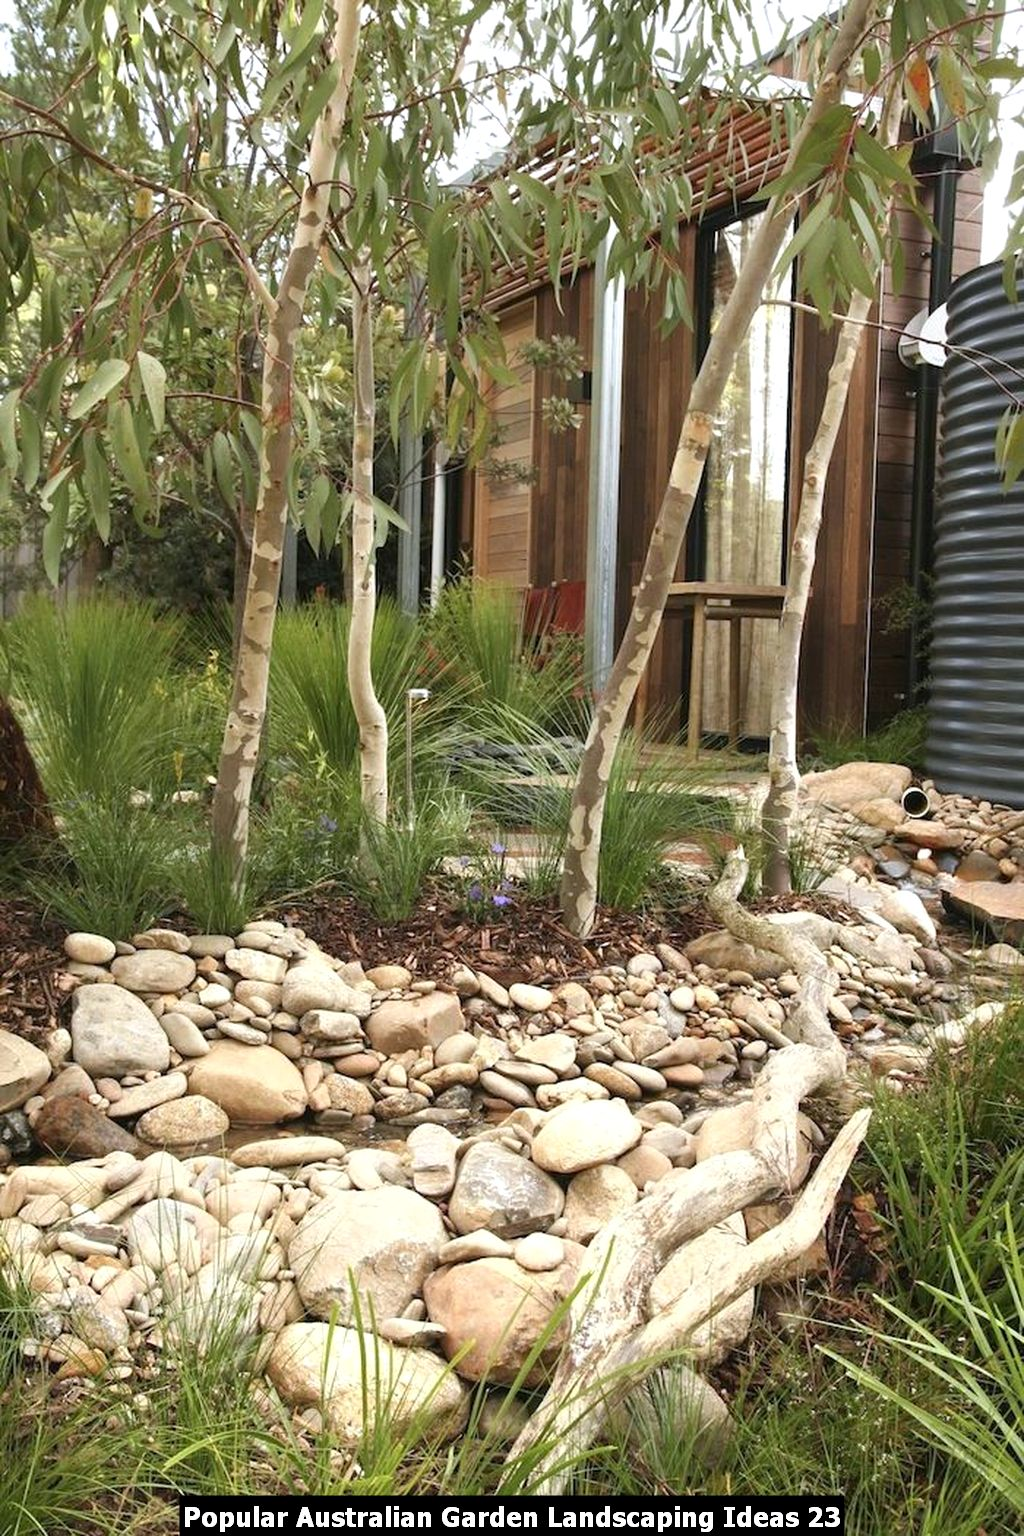 Popular Australian Garden Landscaping Ideas 23